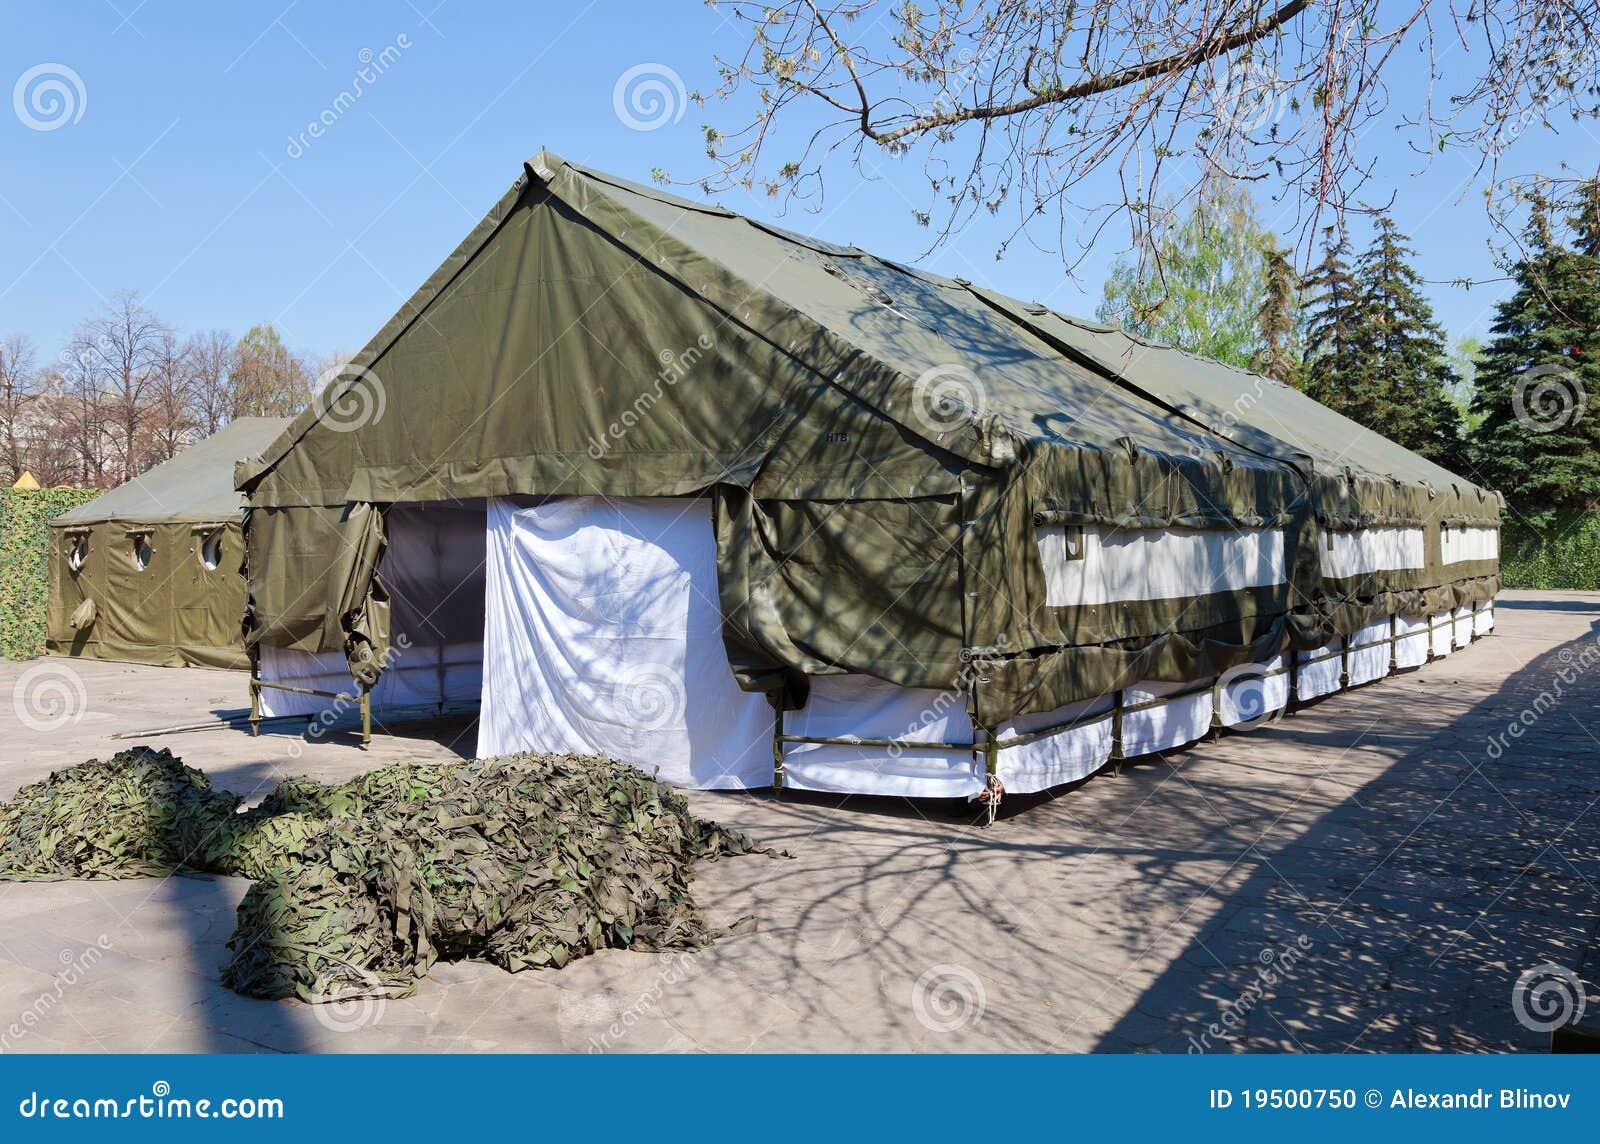 The Army expedition tents & The Army expedition tents stock photo. Image of camp - 19500750